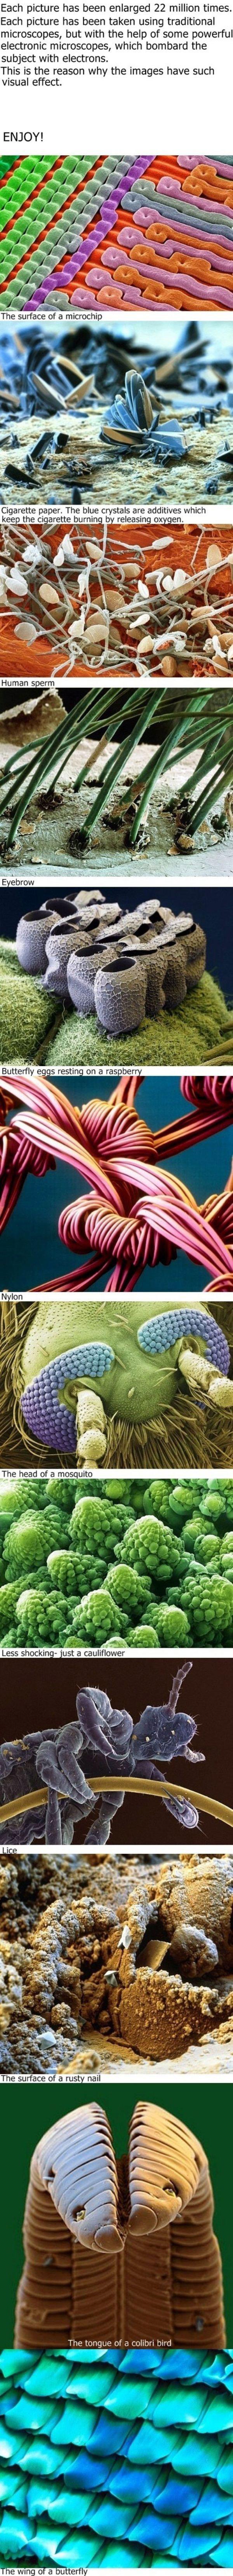 Microscope. .. I feel like I should wash my eyebrows or something...